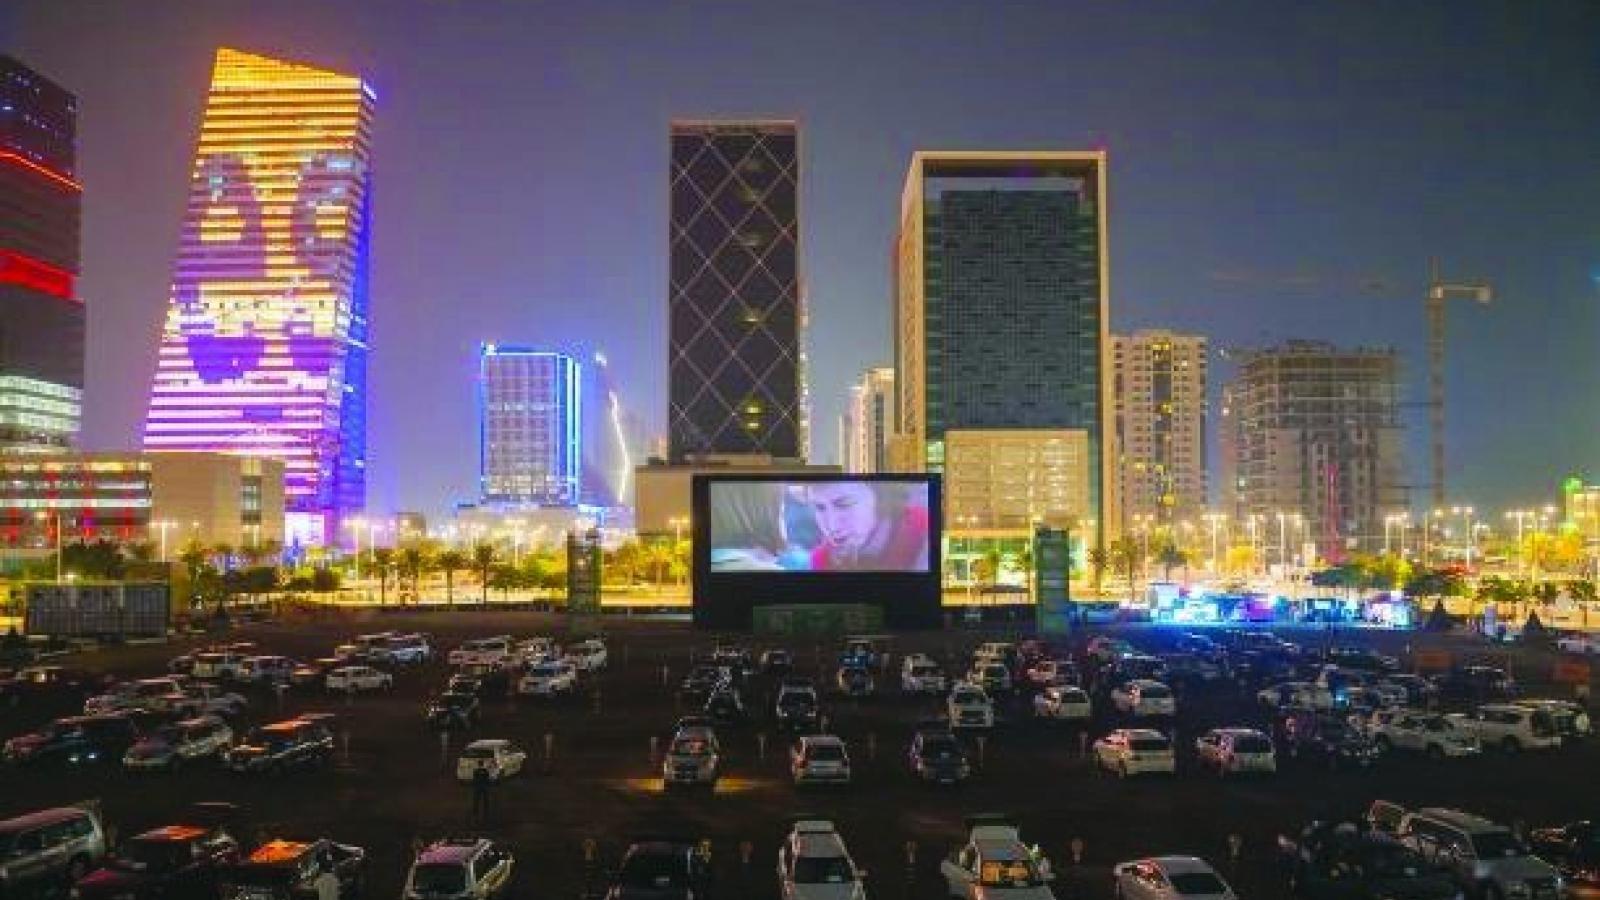 Doha Film Institute to host 9th Ajyal Film Festival hybrid edition during November